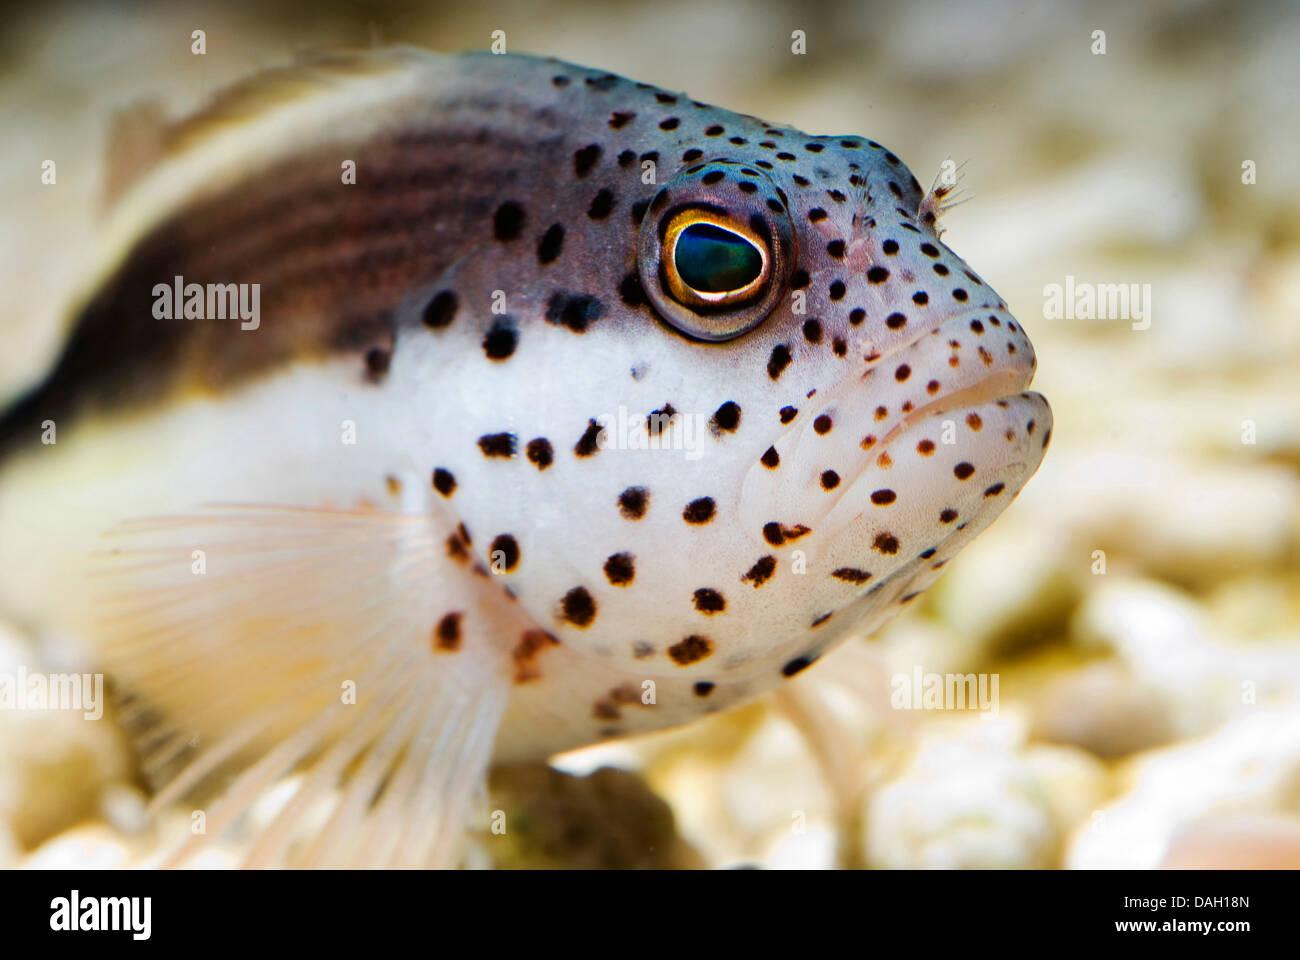 freckled hawkfish, Forster's hawkfish, blackside hawkfish (Paracirrhites forsteri), portrait - Stock Image